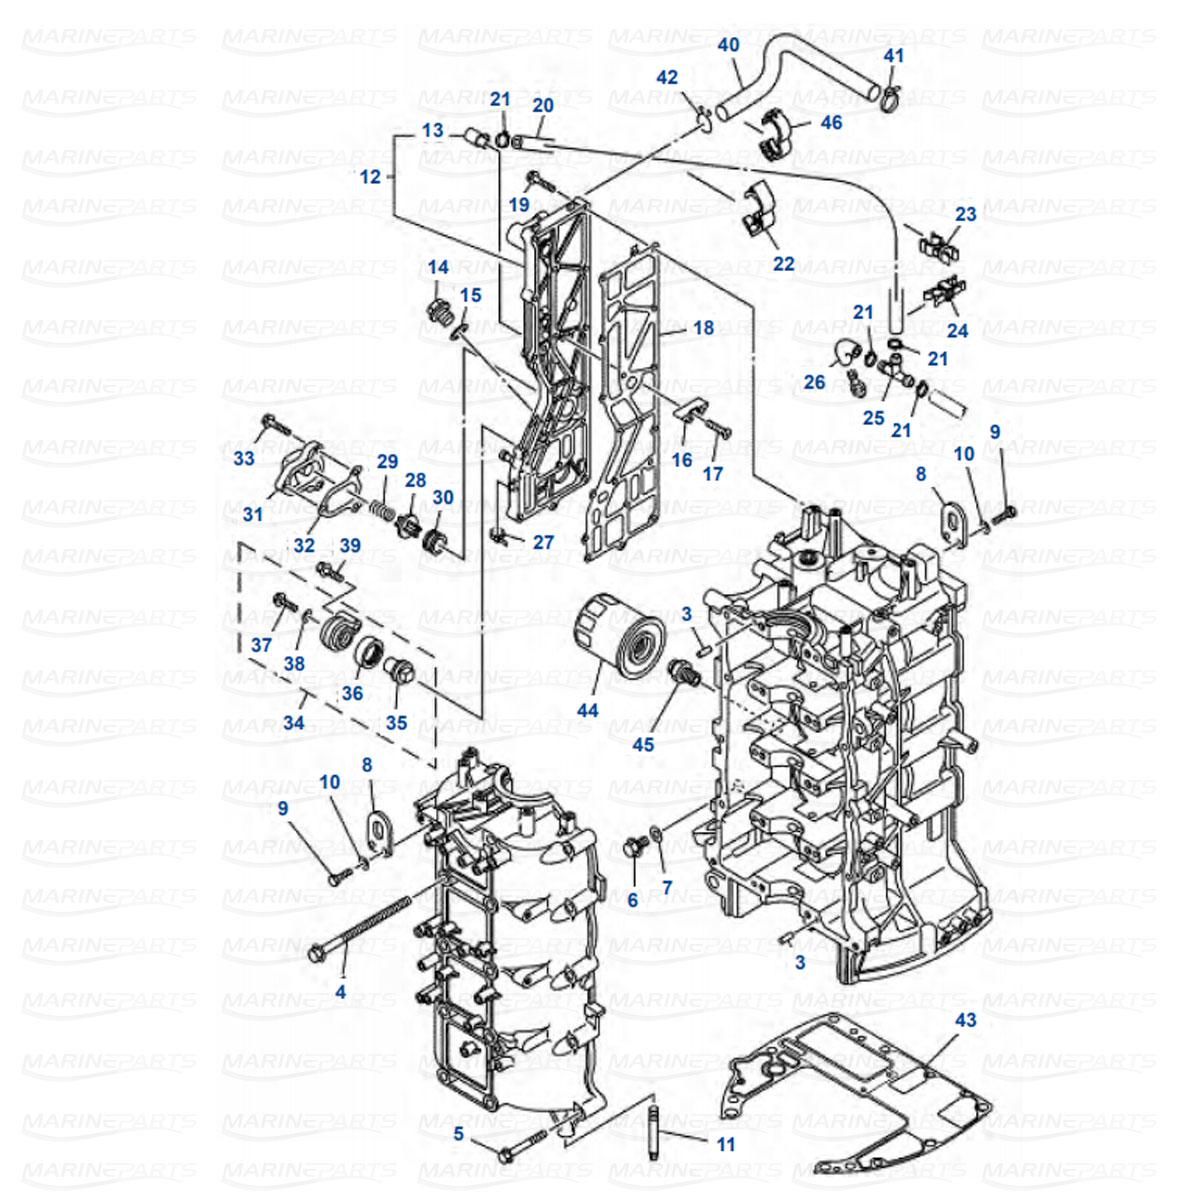 Öljynsuodatin Yamaha/Honda/Tohatsu/Mercury 9.9-115 hv